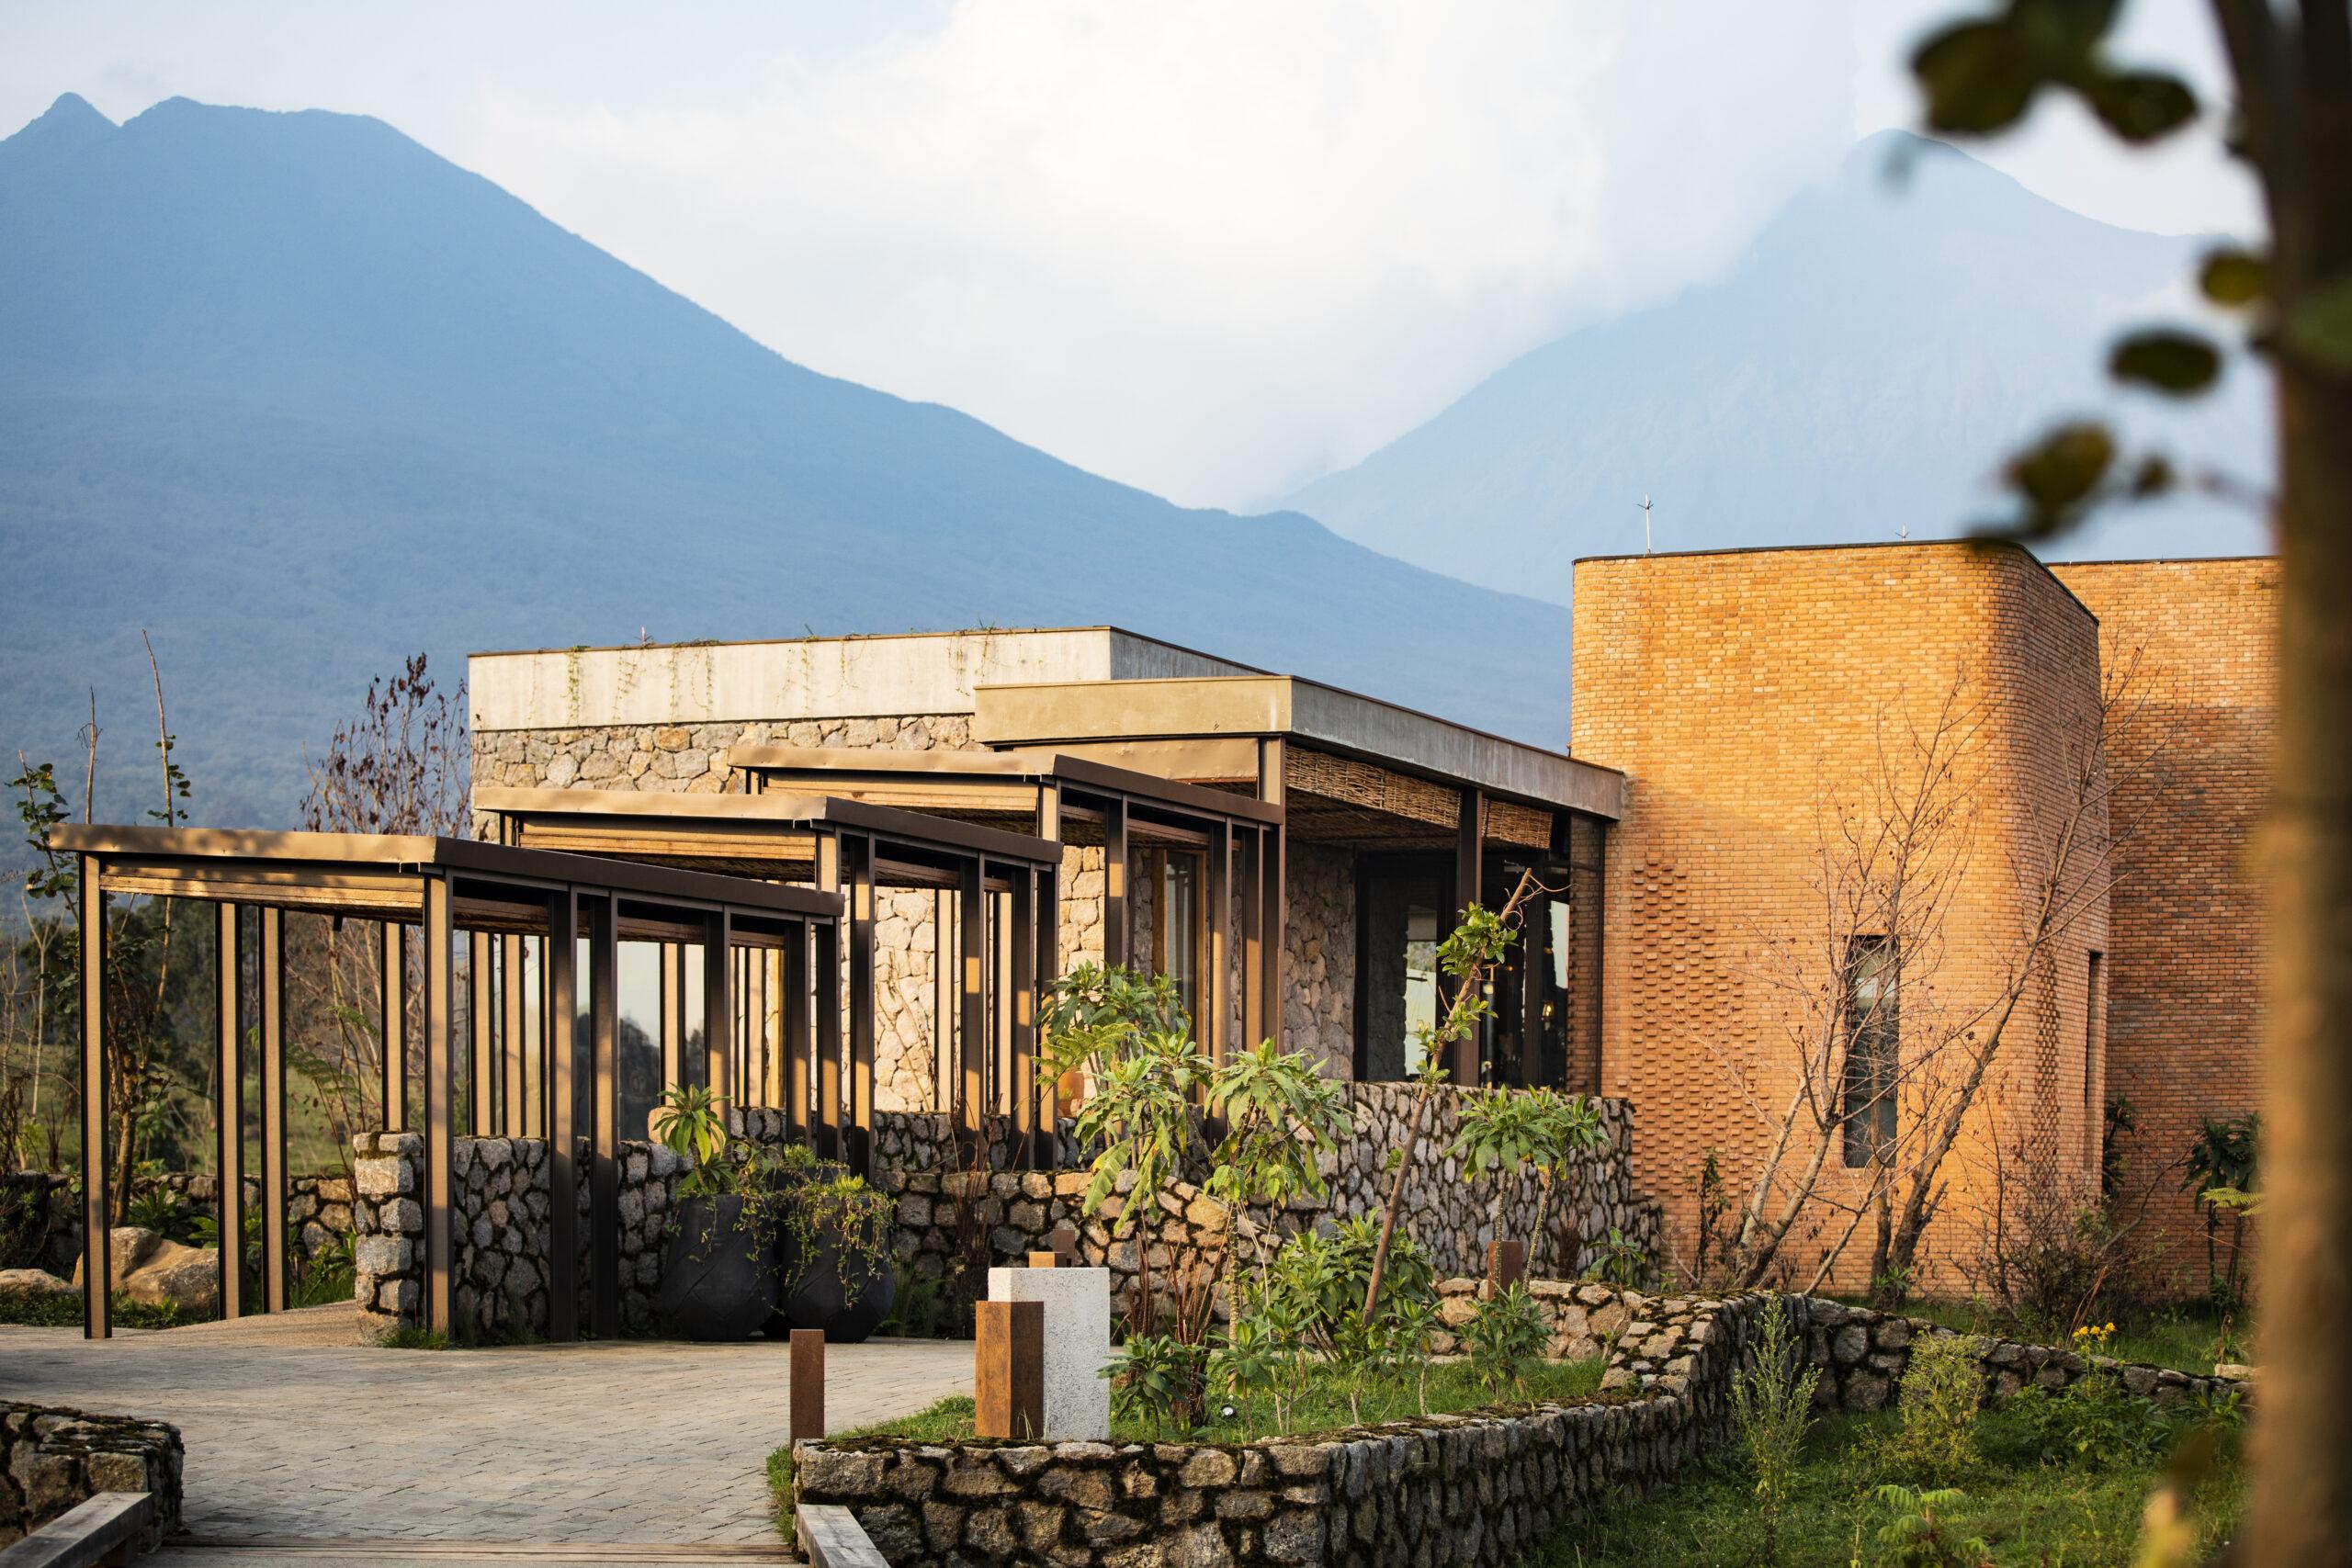 singita, kwitonda, rwanda, africa, volcano, luxury resort, travel, helen siwak, coleman pete, ecoluxluv, folioyvr, vancouver, bc, vancity, yvr